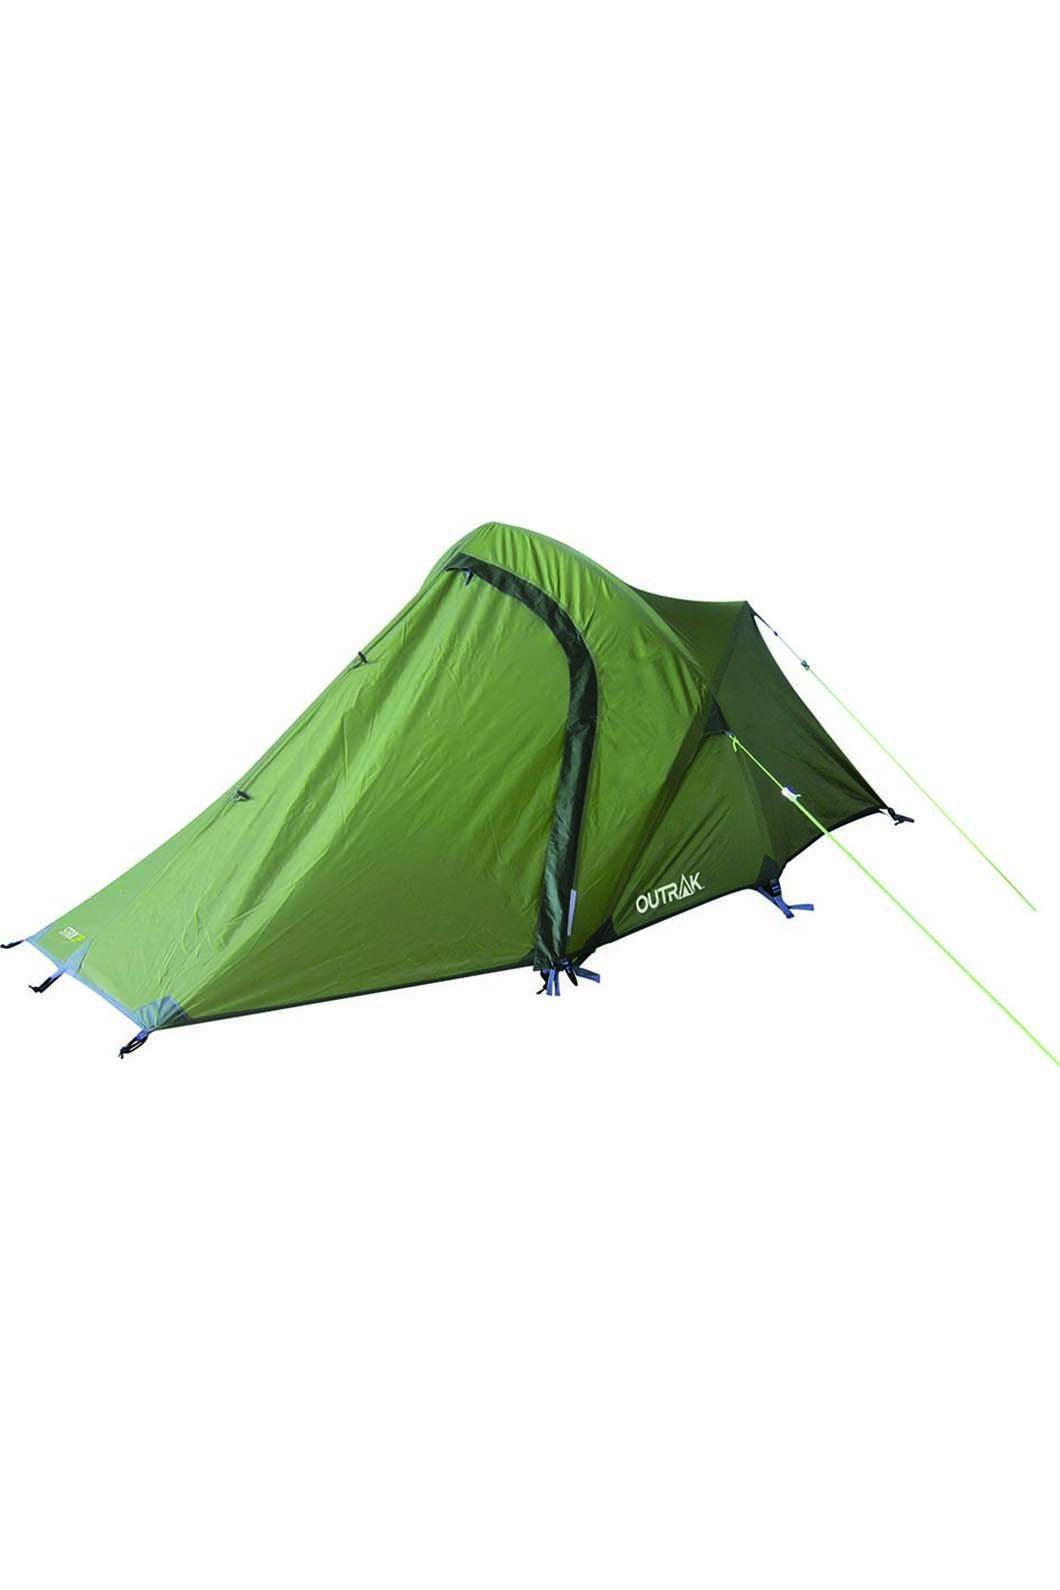 Outrak Strix 2 Person Hiking Tent, None, hi-res